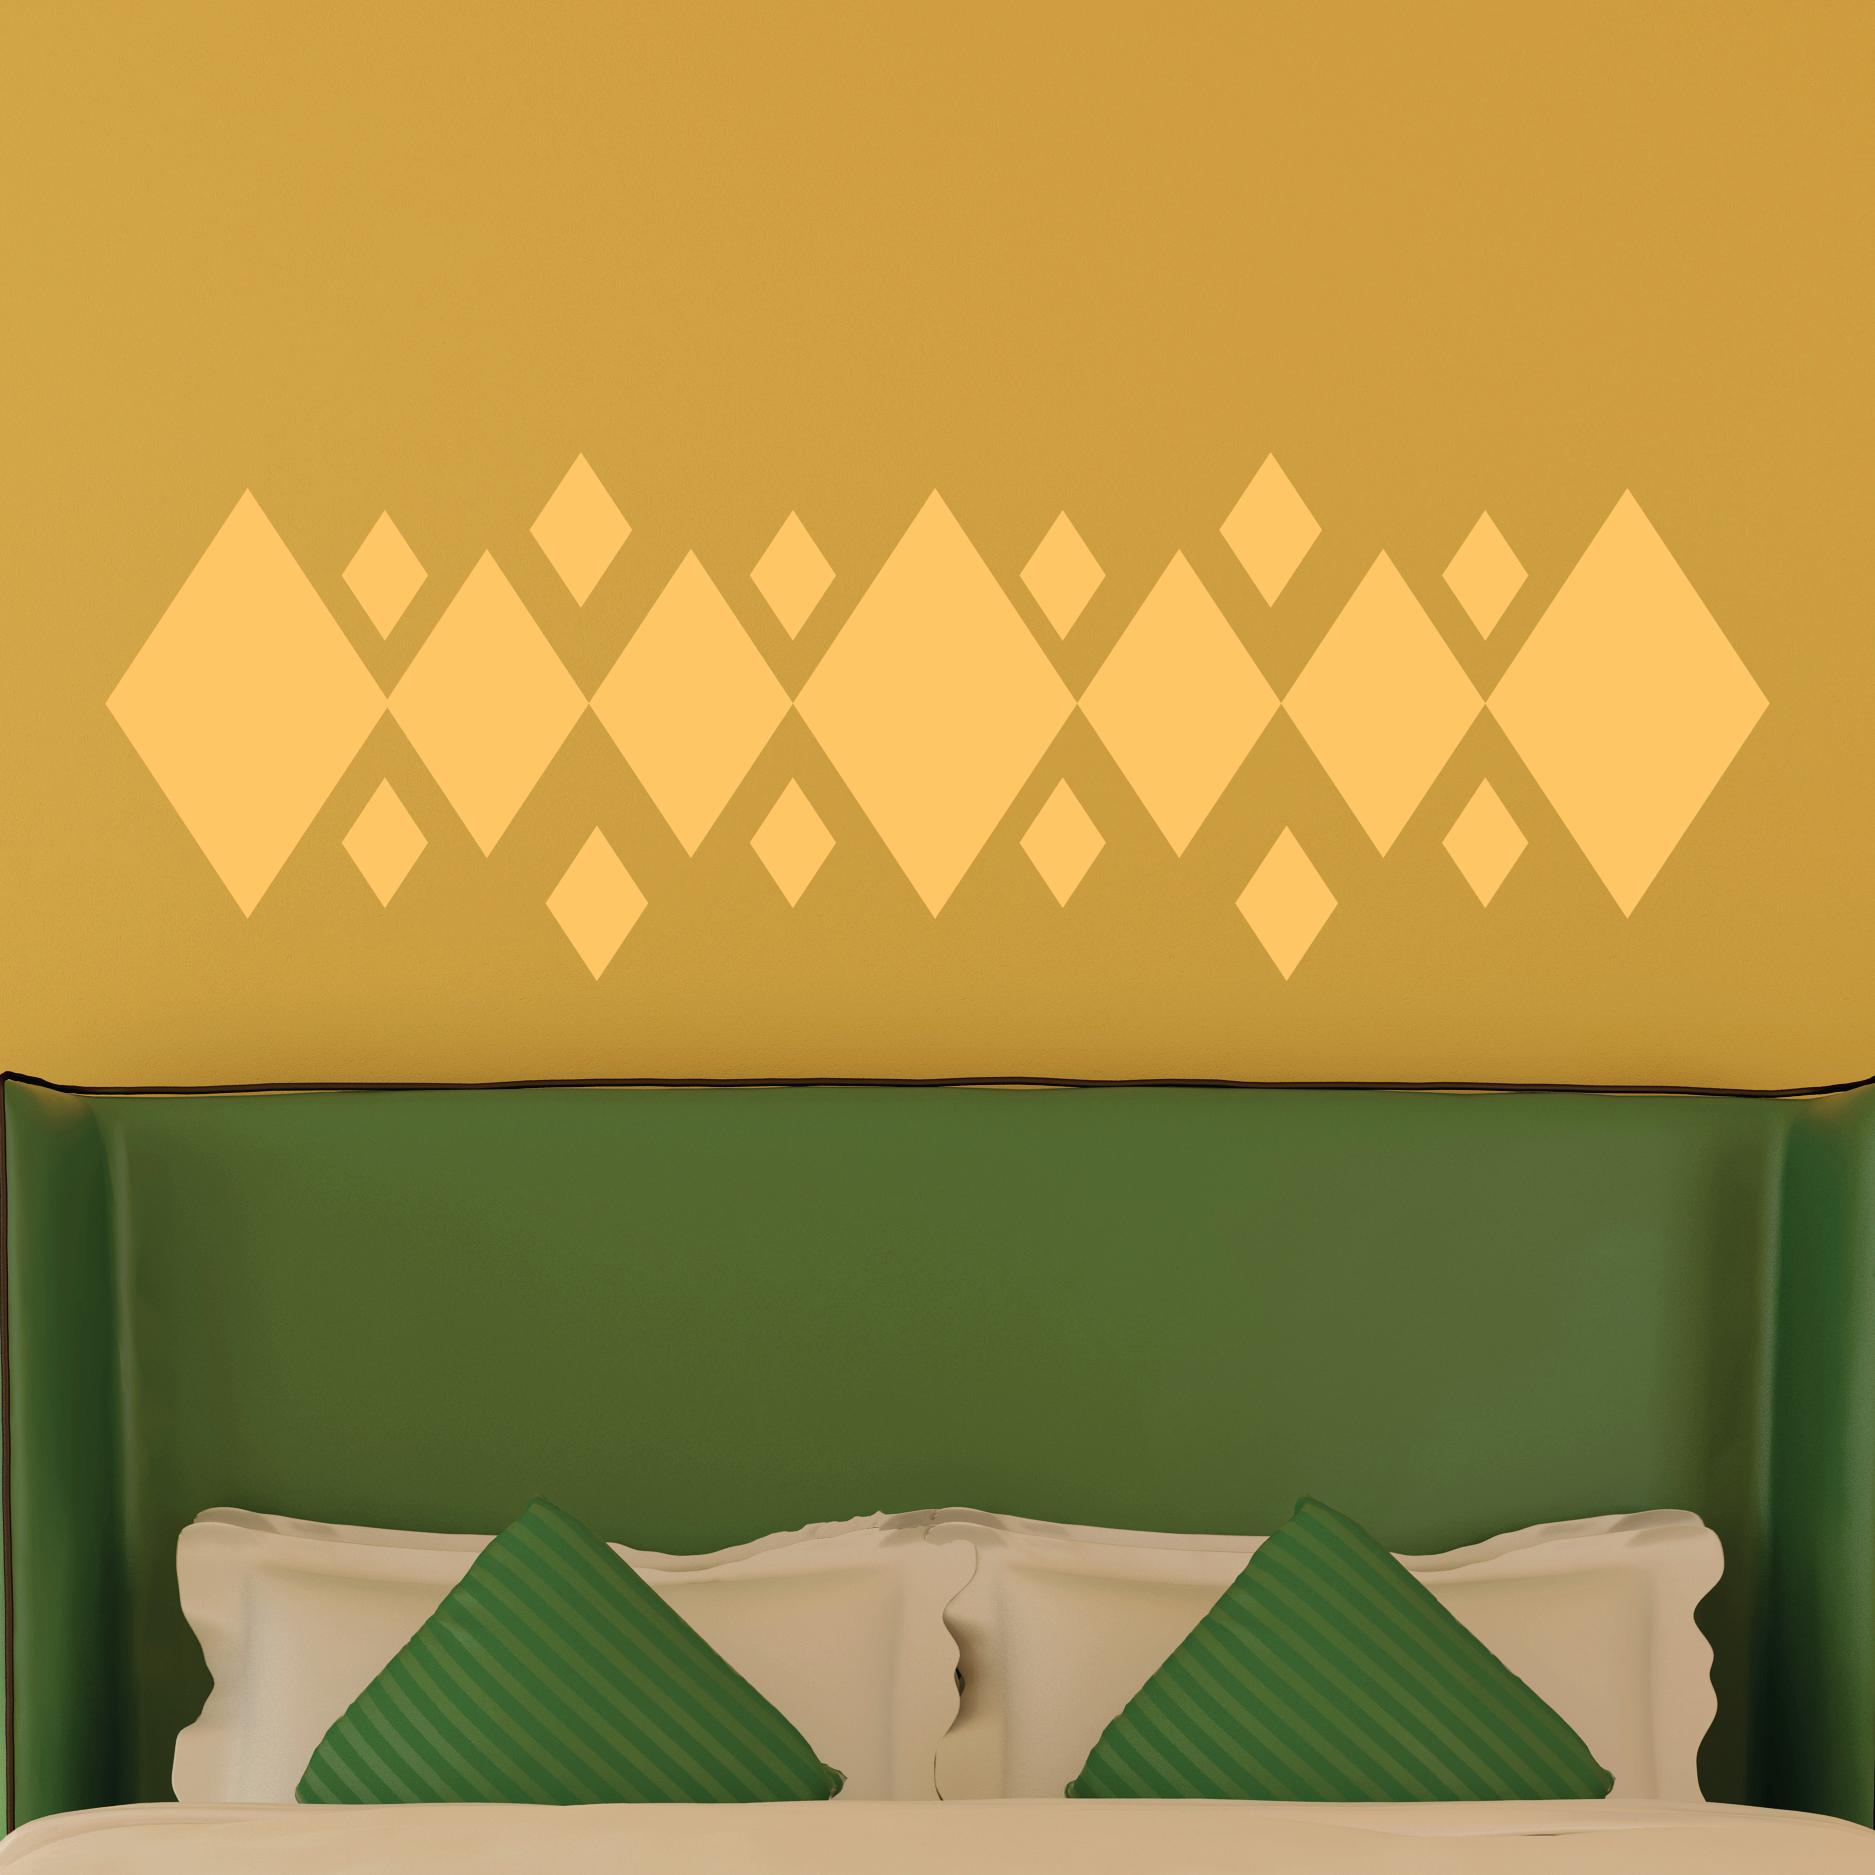 Diamond Headboard Wall Quotes Wall Art Decal